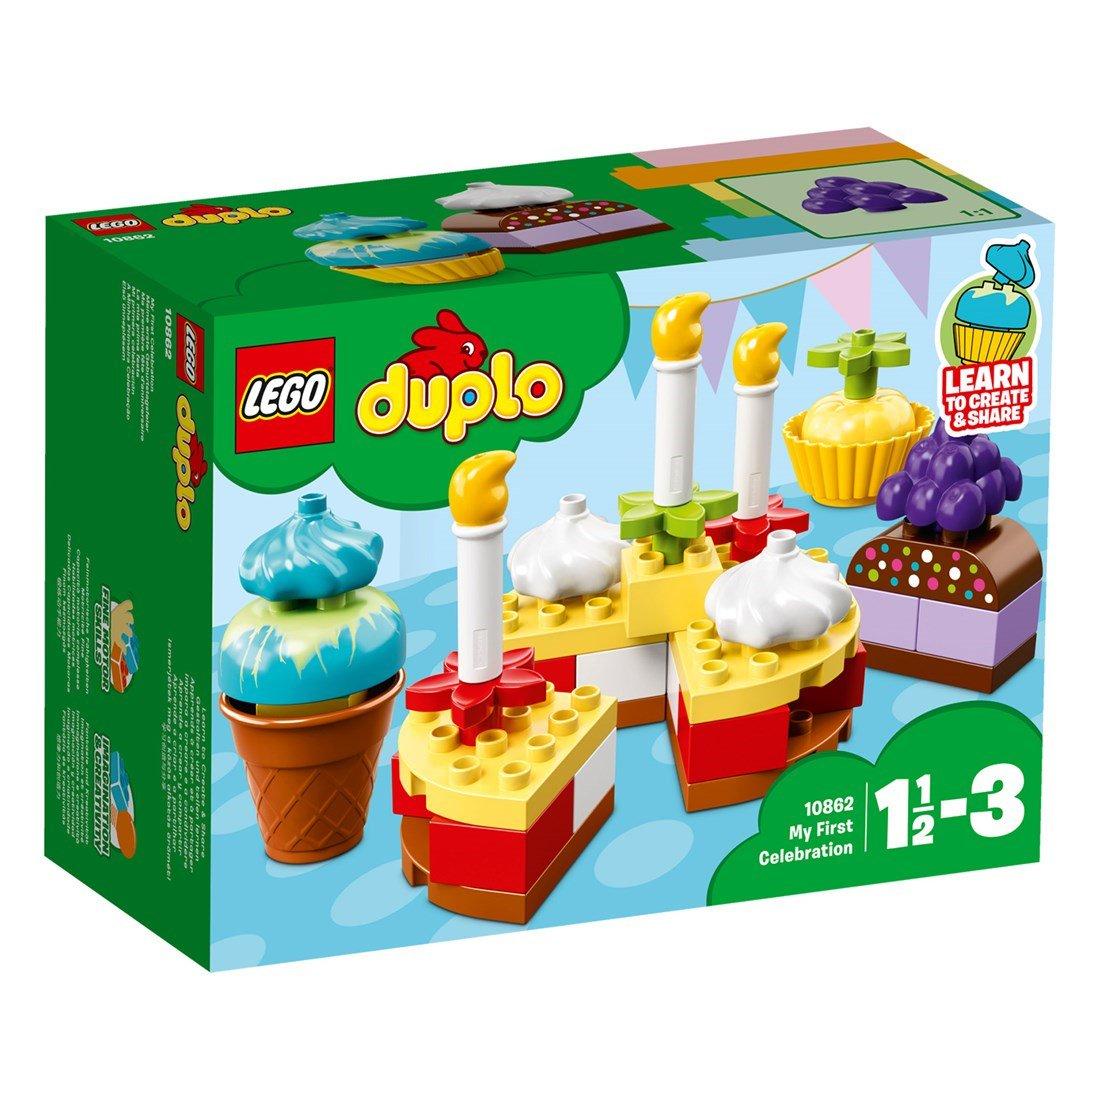 Duplo lego - tips på leksaker 1 år